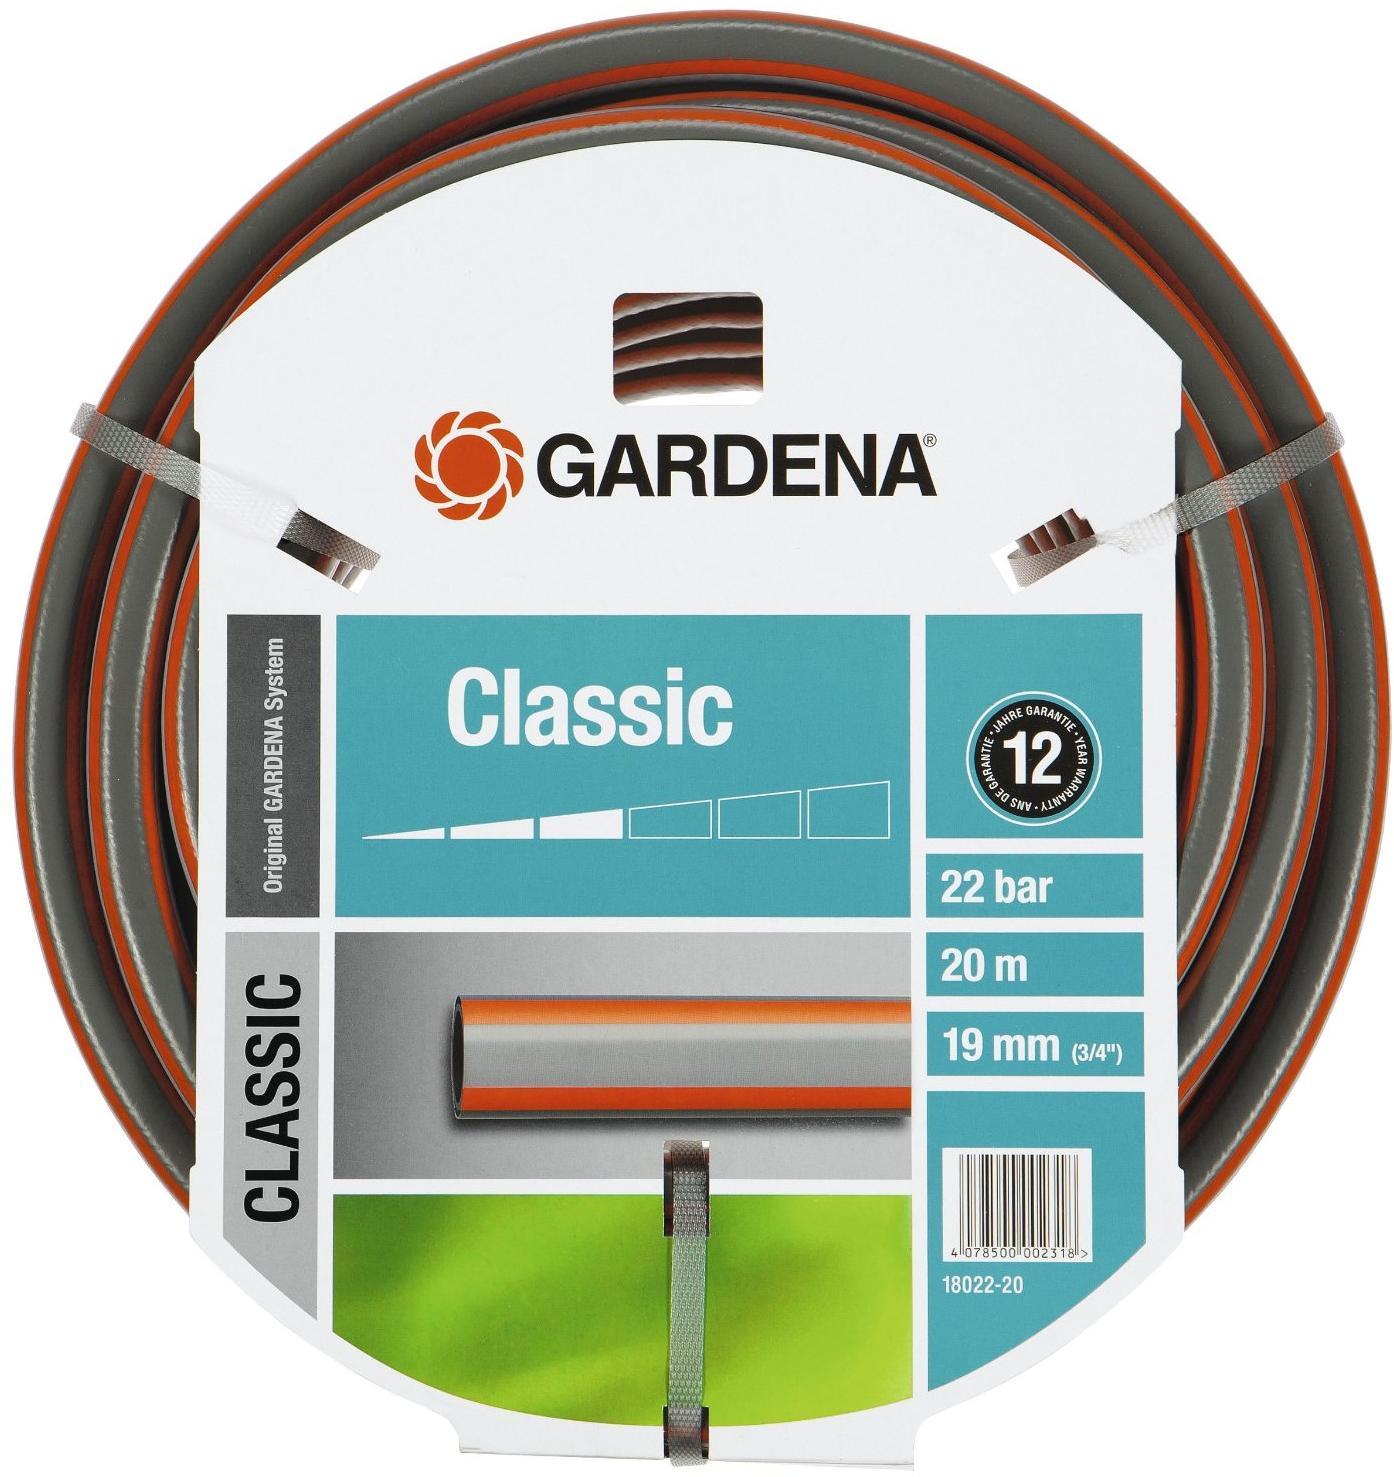 gardena classic schlauch gardena 18022 20 19 mm 3 4. Black Bedroom Furniture Sets. Home Design Ideas